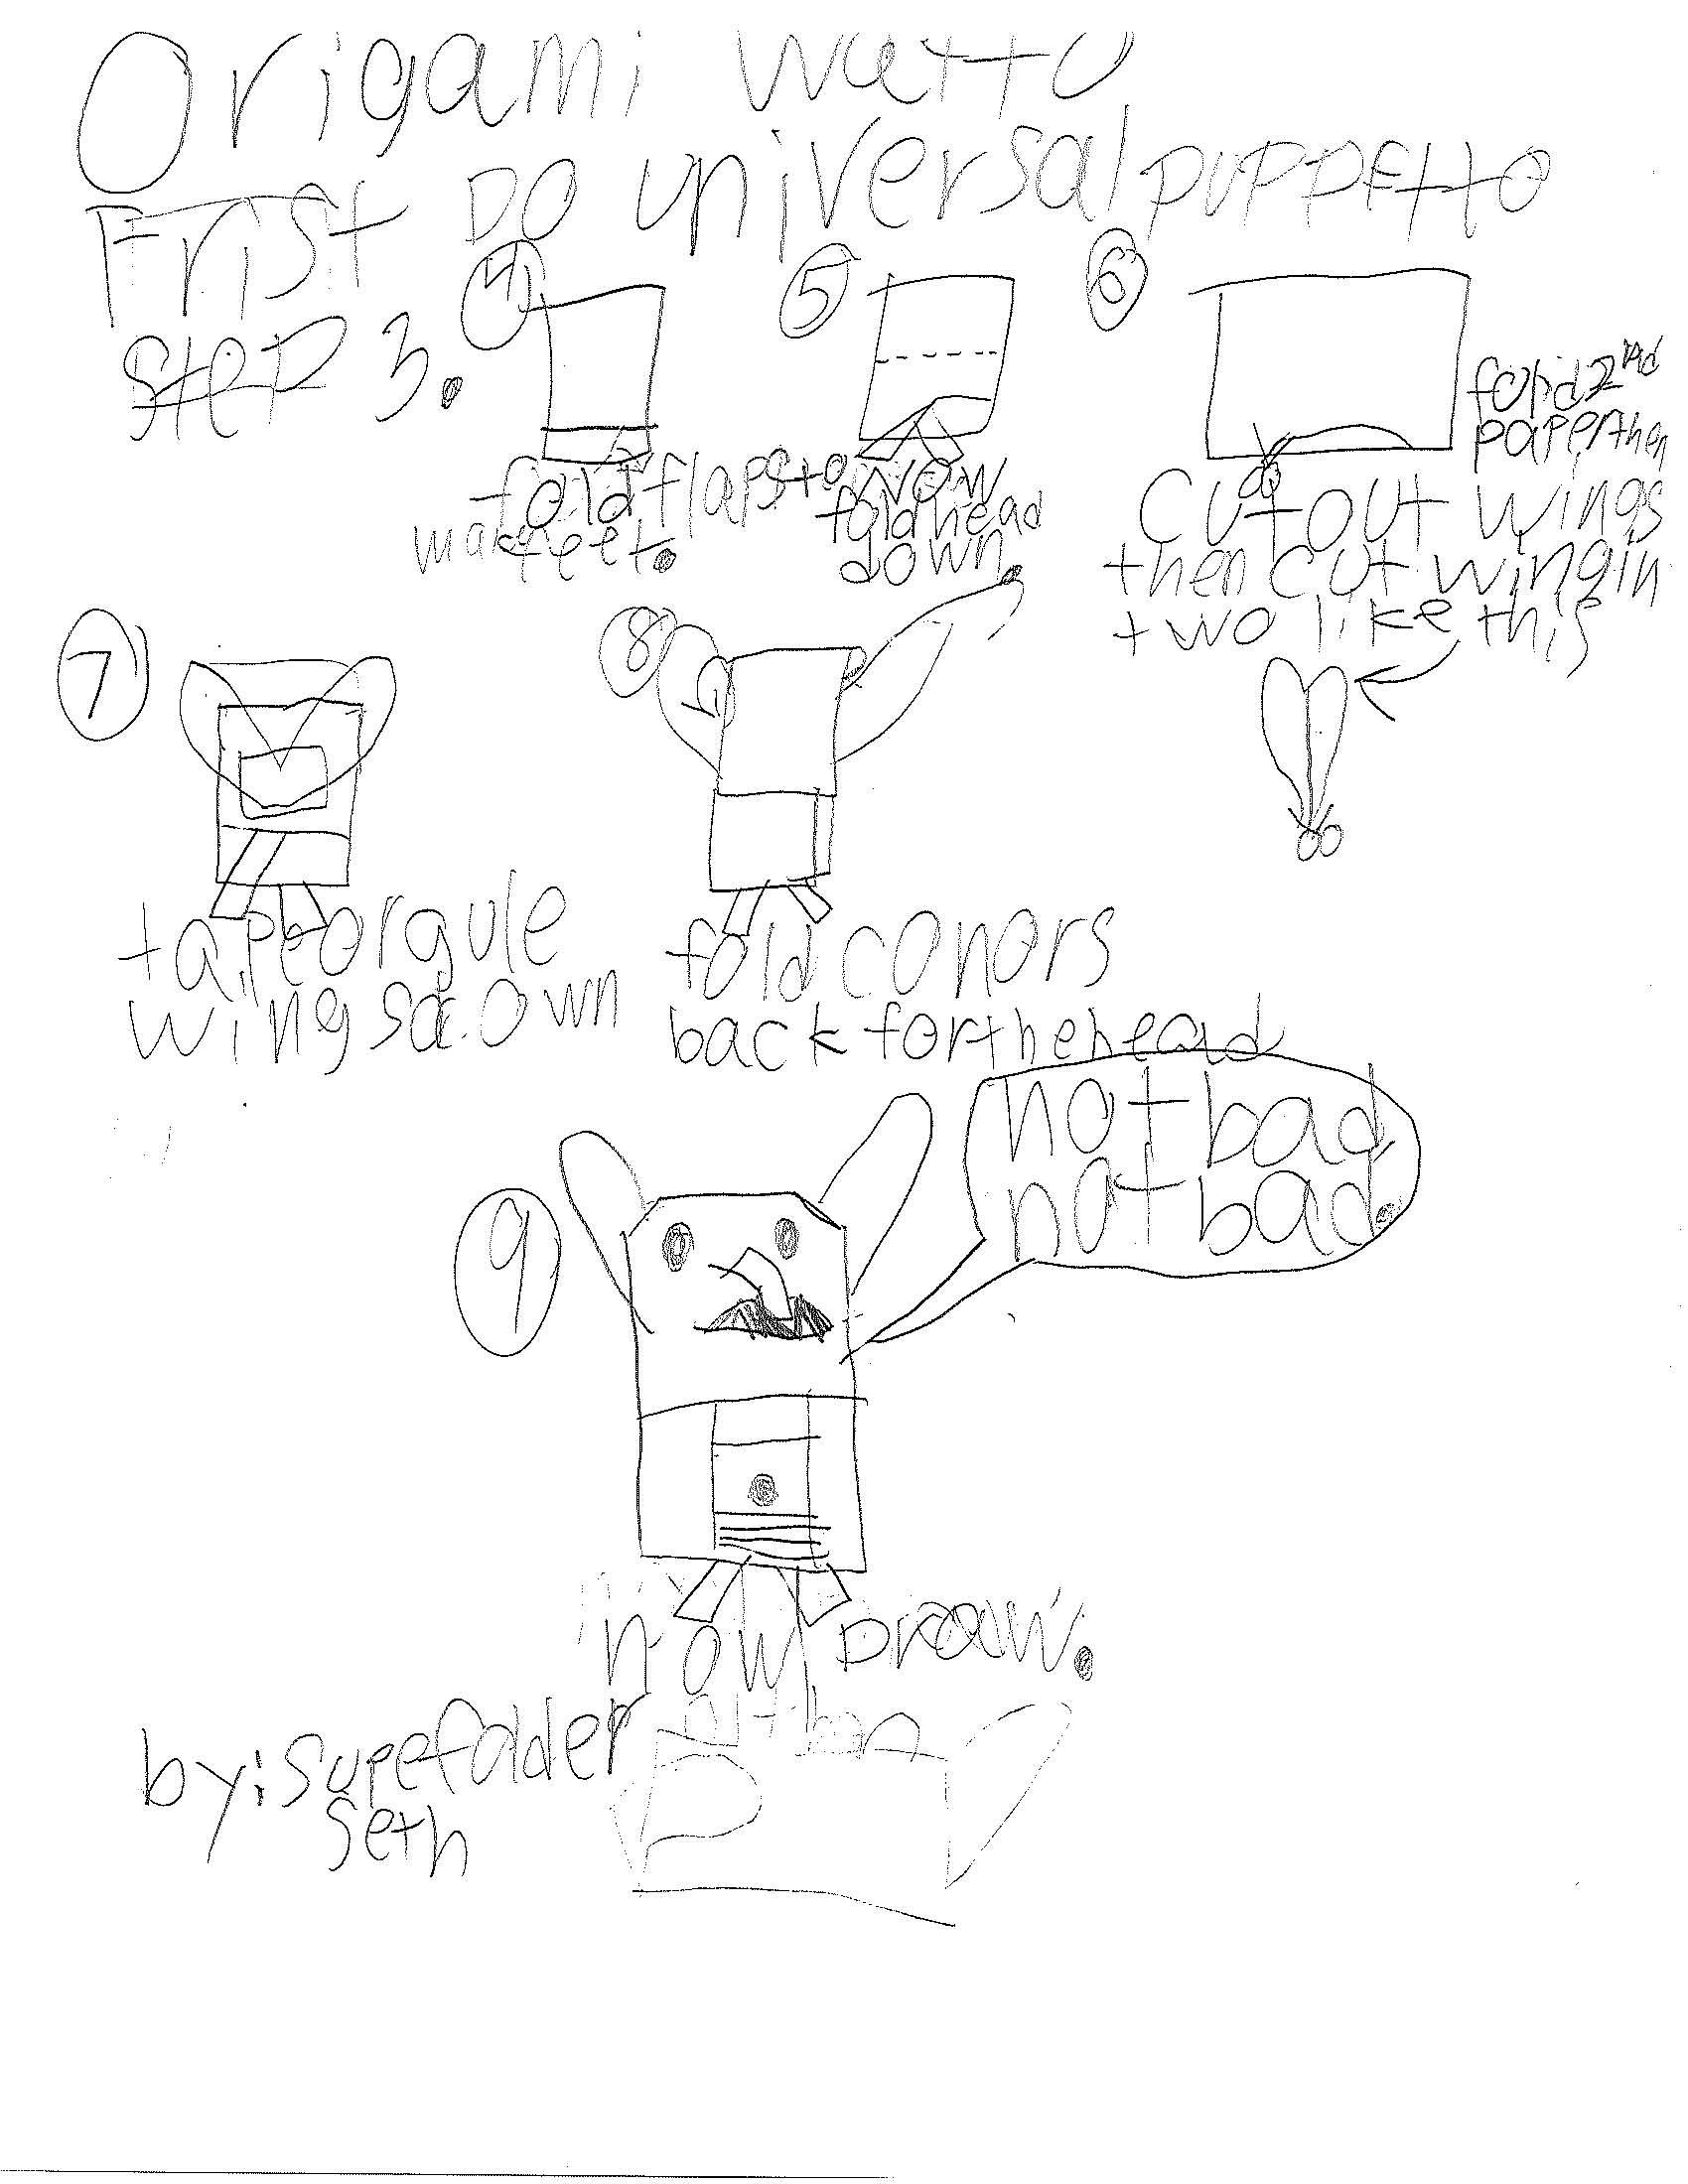 Seth SuperFolder's STOOKY 4-H Project + Watto instrux